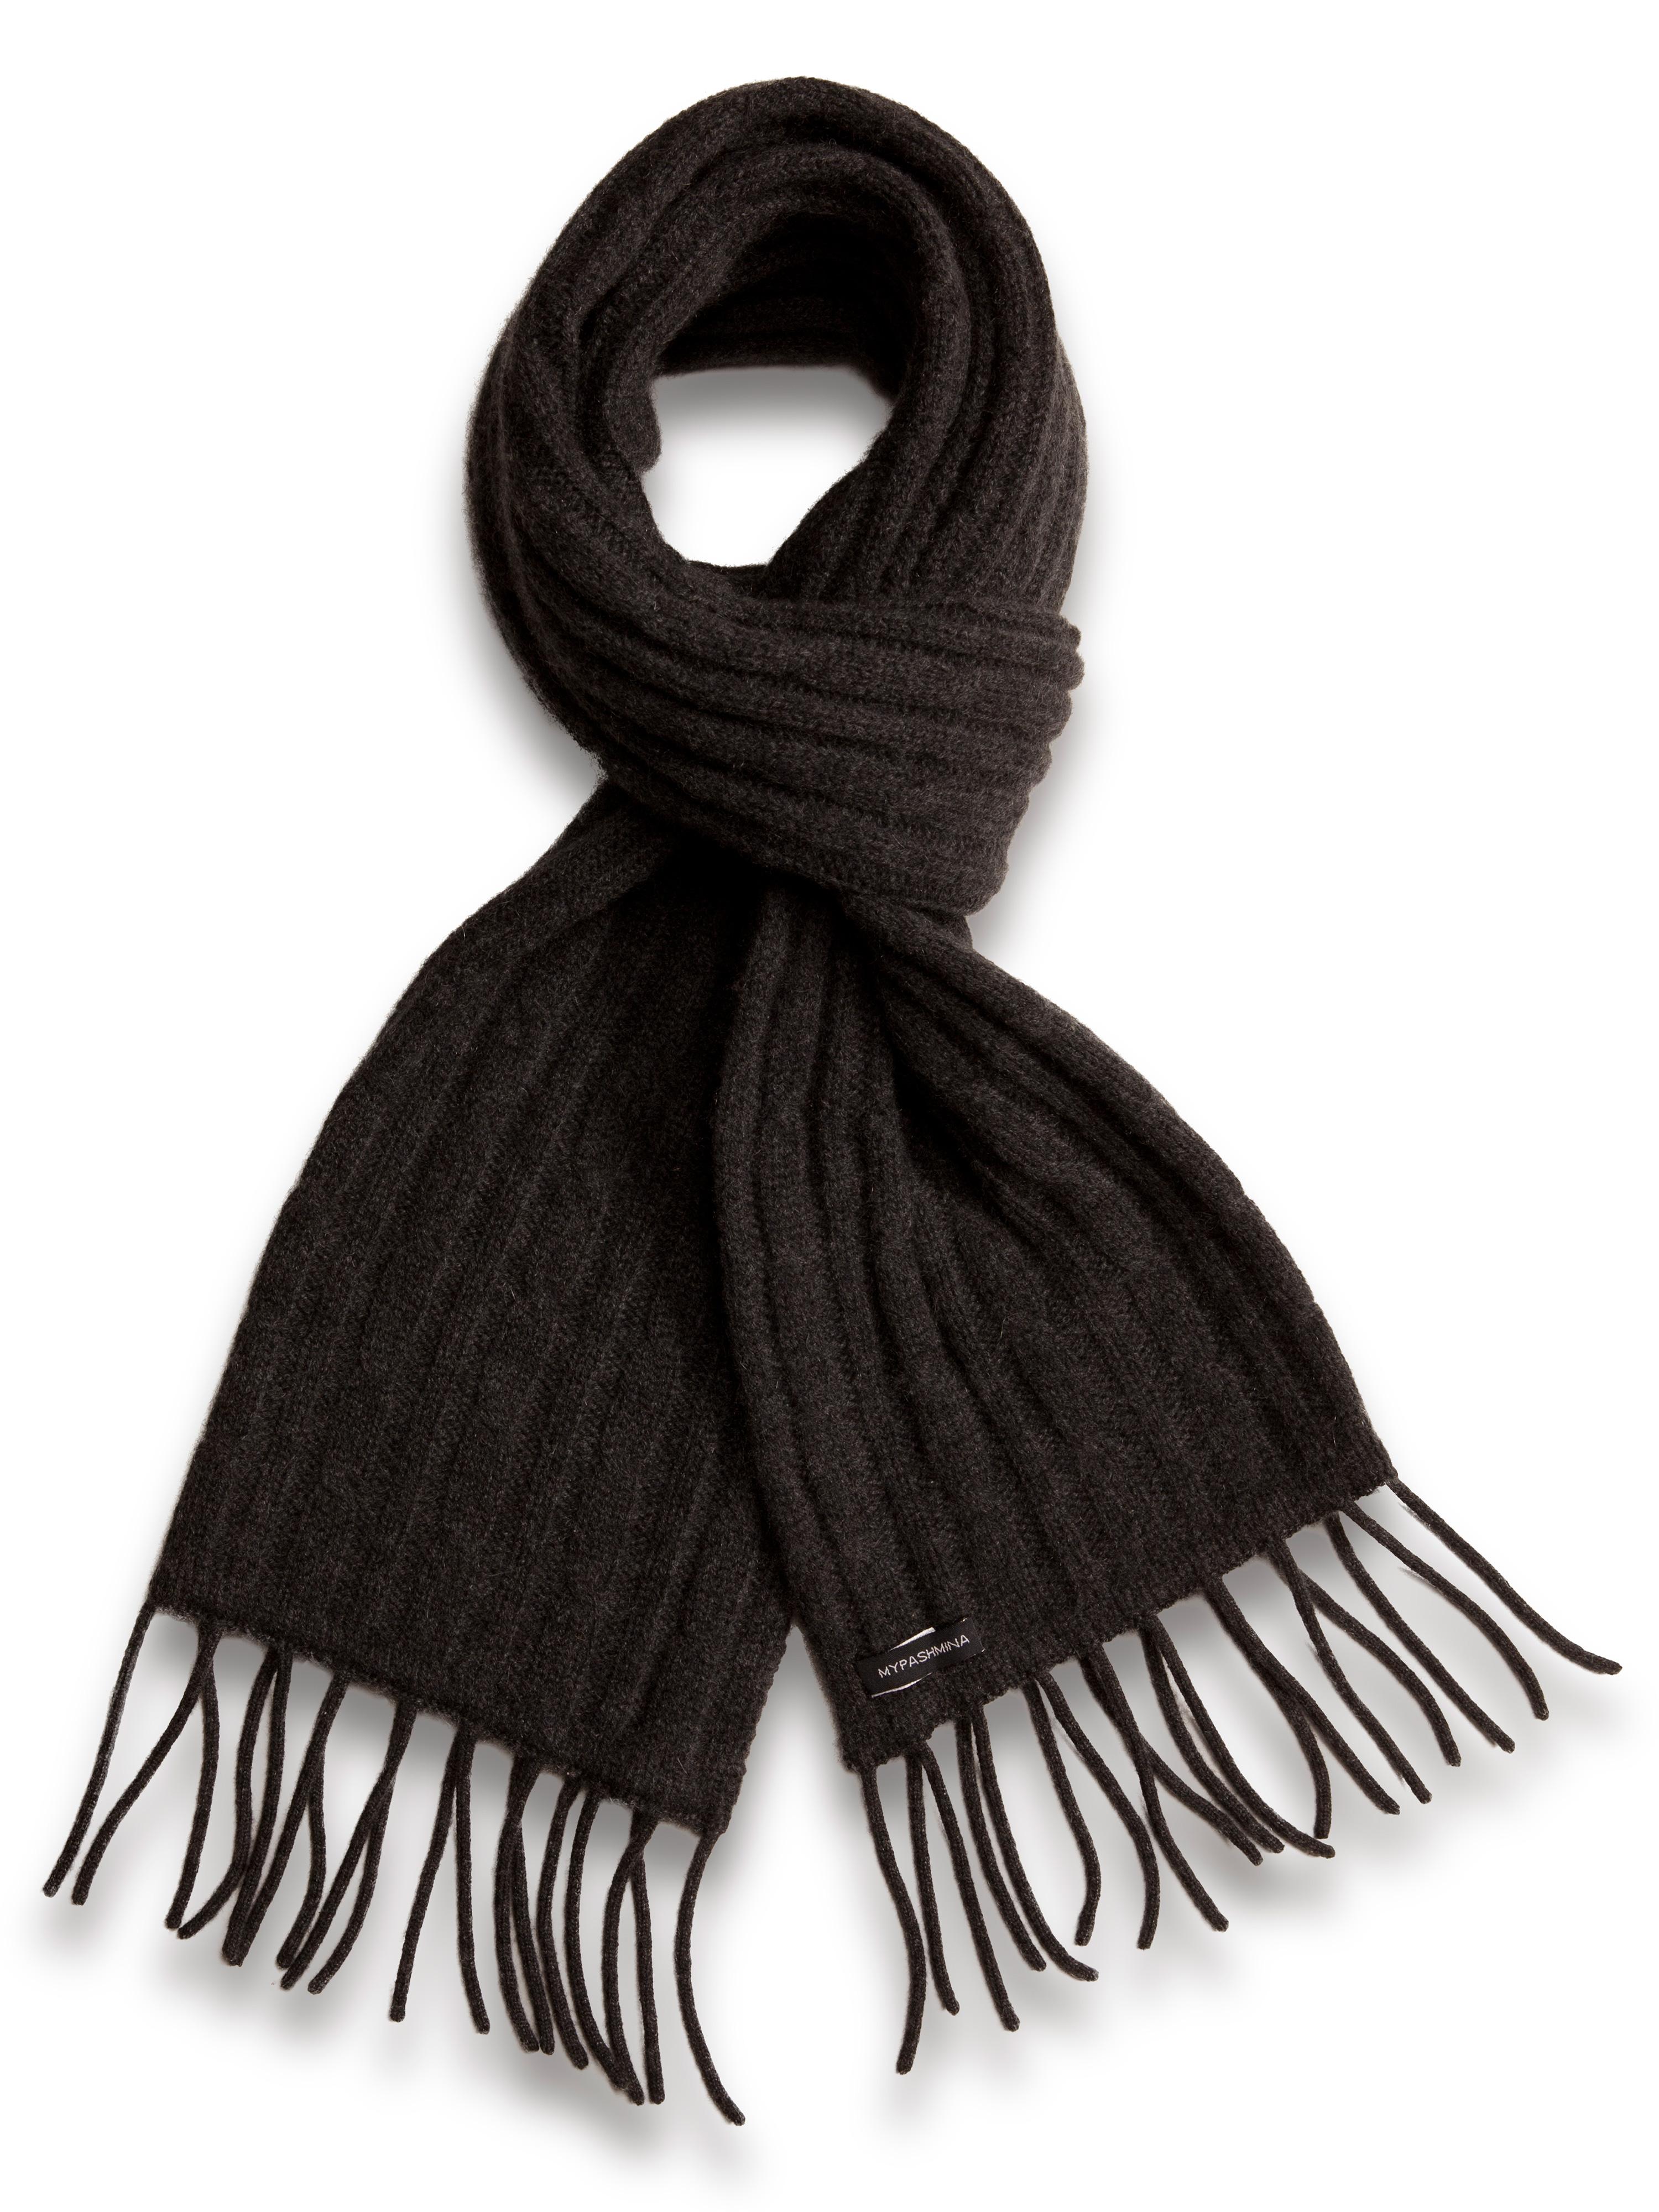 Cable Knit Scarf - 100% Cashmere - 35x180cm - Melange Dark Grey